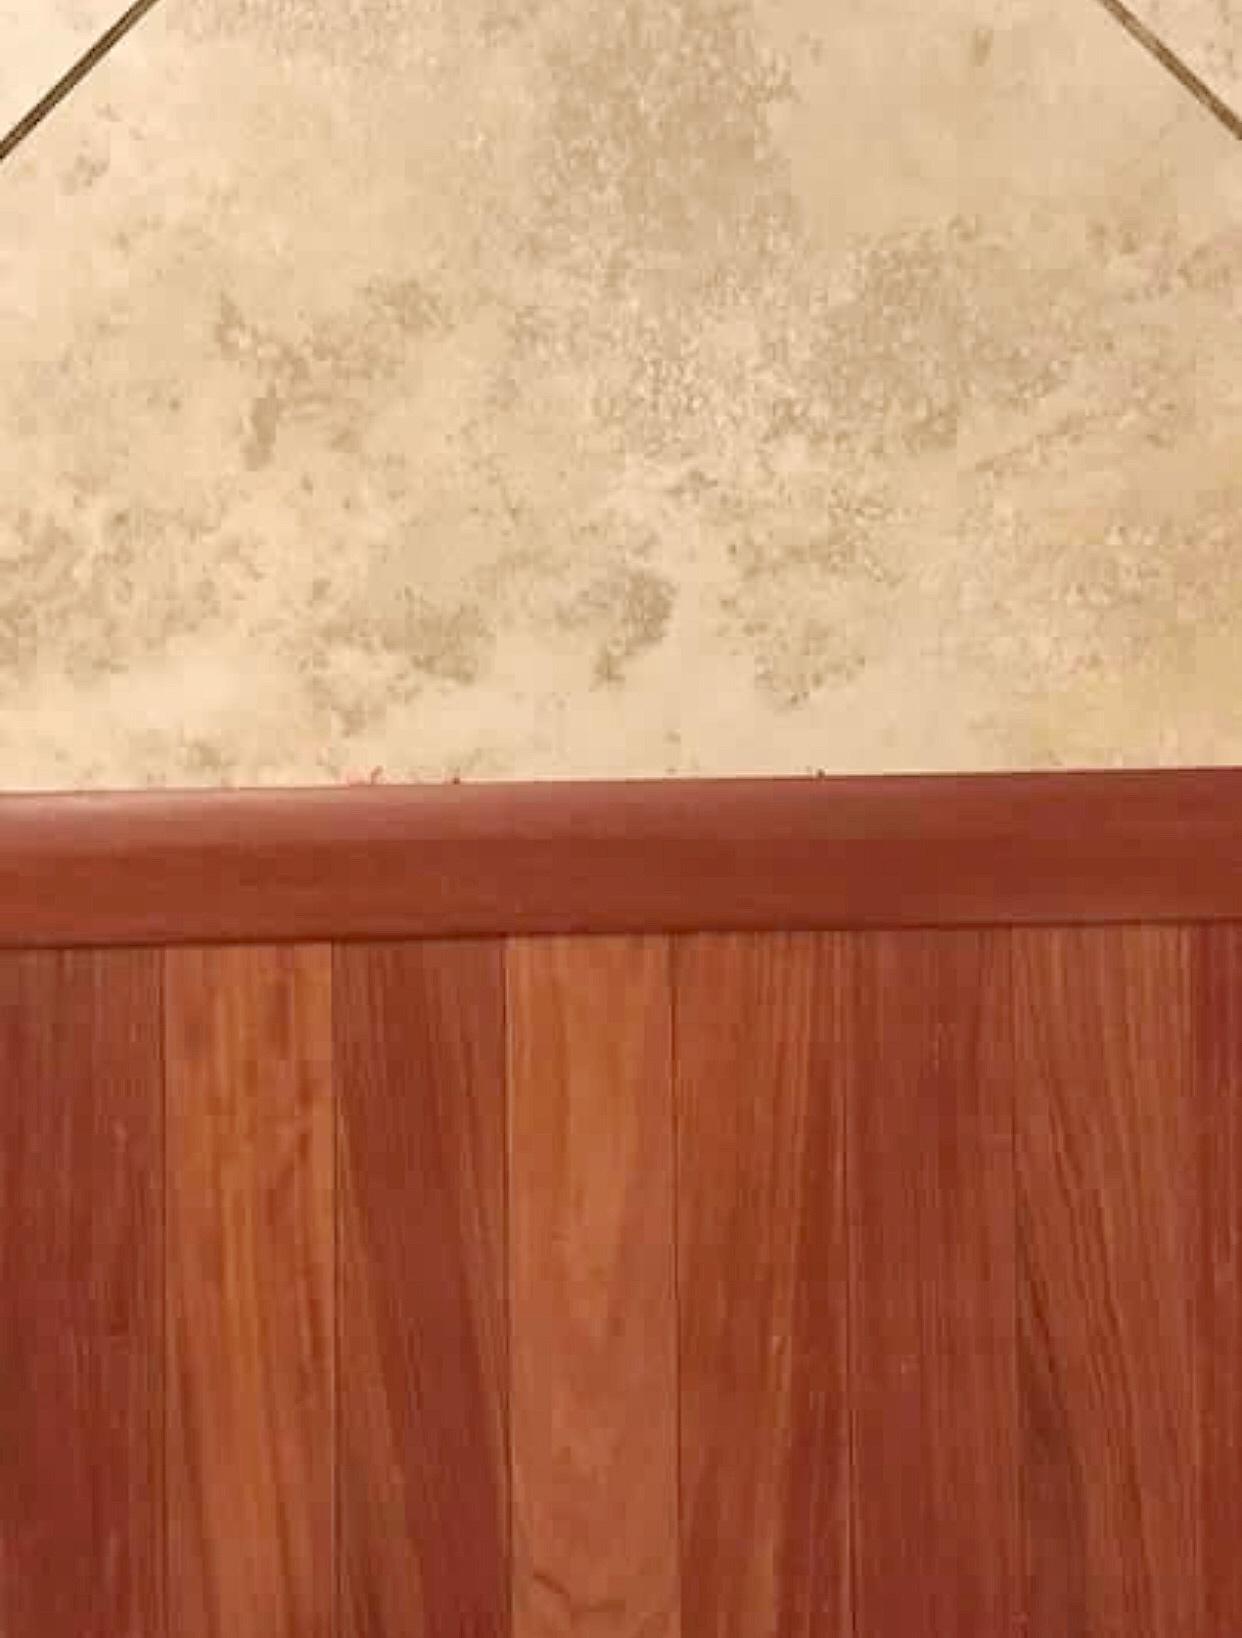 Transition from Wood To Tile Jana Donohoe Designs Fayetteville North Carolina 28301, 28303, 28304, 28305, 28306, 28307, 28308, 28310, 28311, 28312, 28314, 28390, 28395. .jpeg